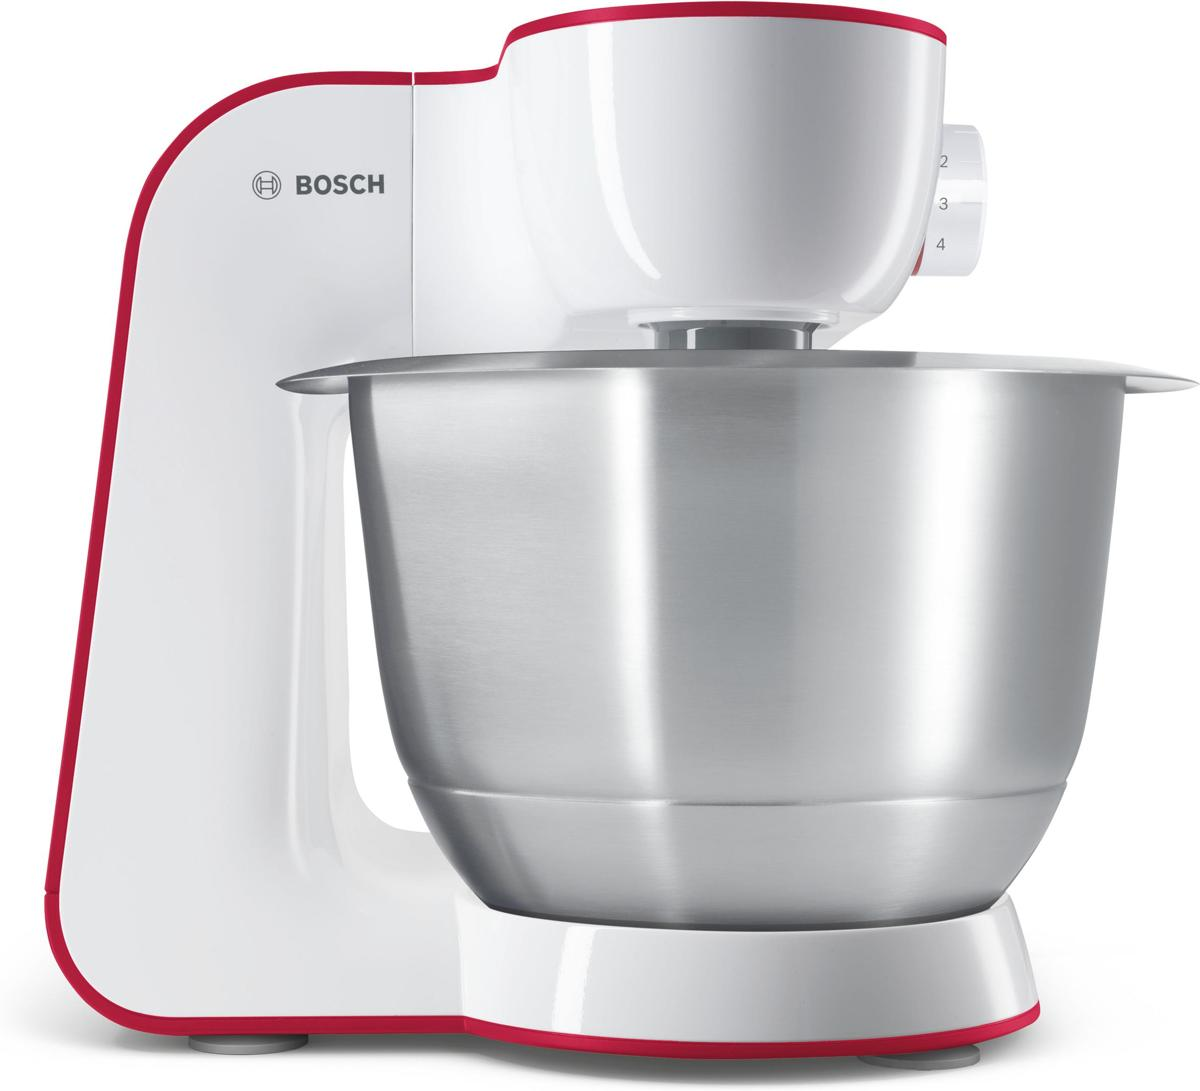 Bosch keukenmachine MUM54R00 - wit/rood